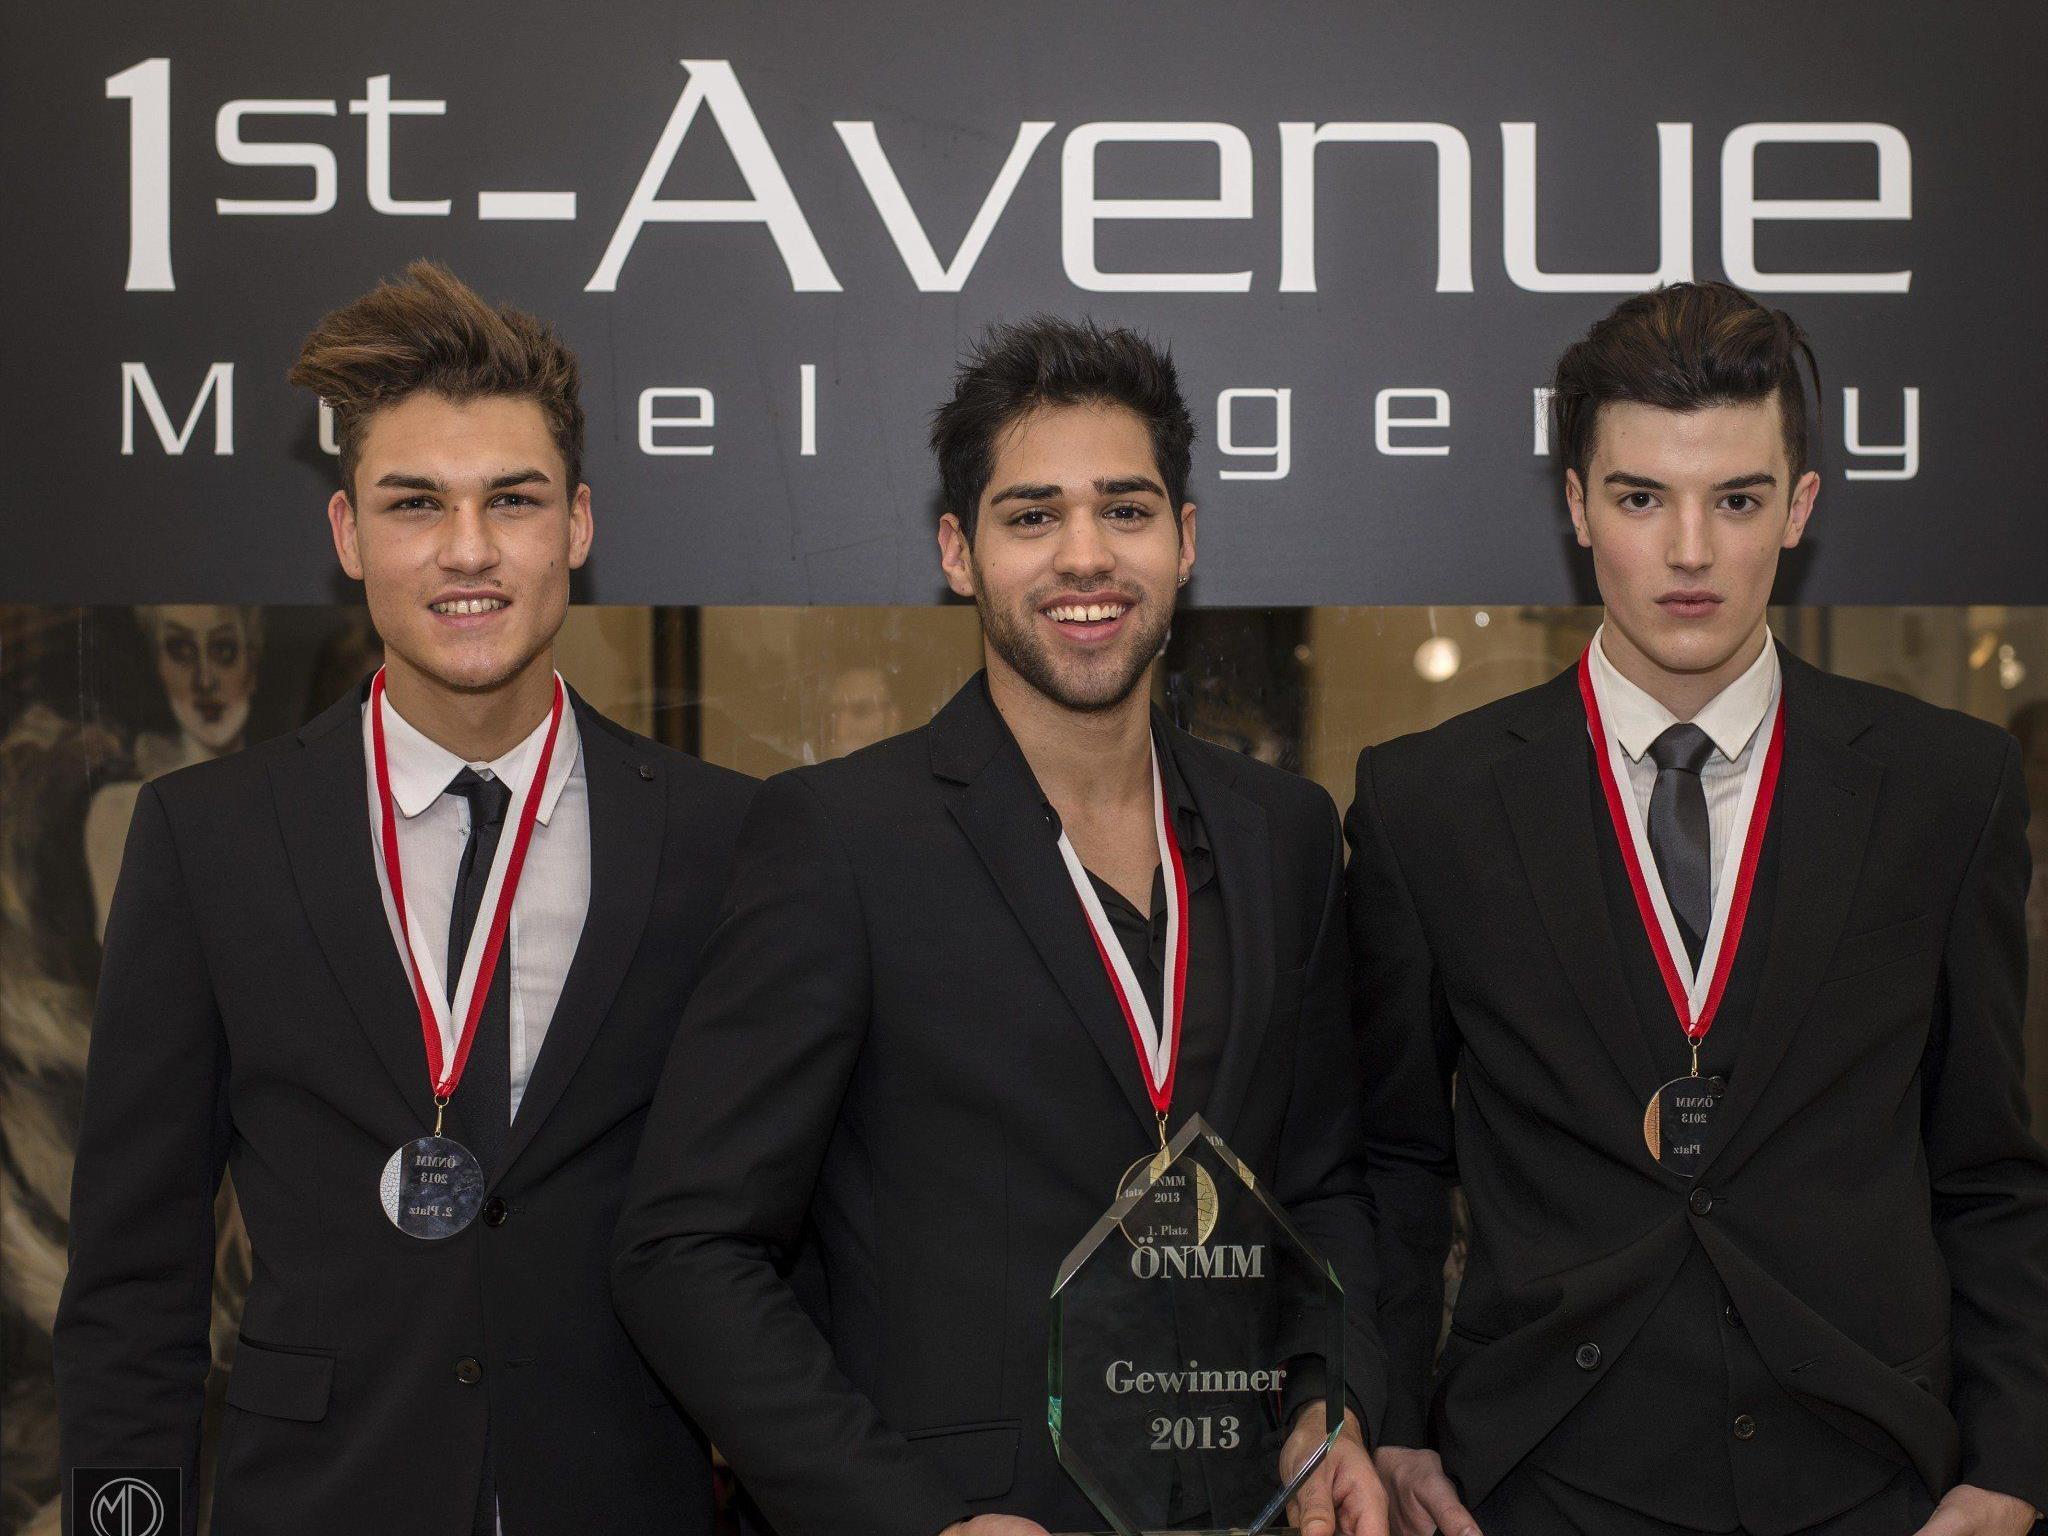 Jerome Jaksch (2.Platz), Bernardo de Oliveira (1.Platz), Paul Csitkovic (3.Platz)